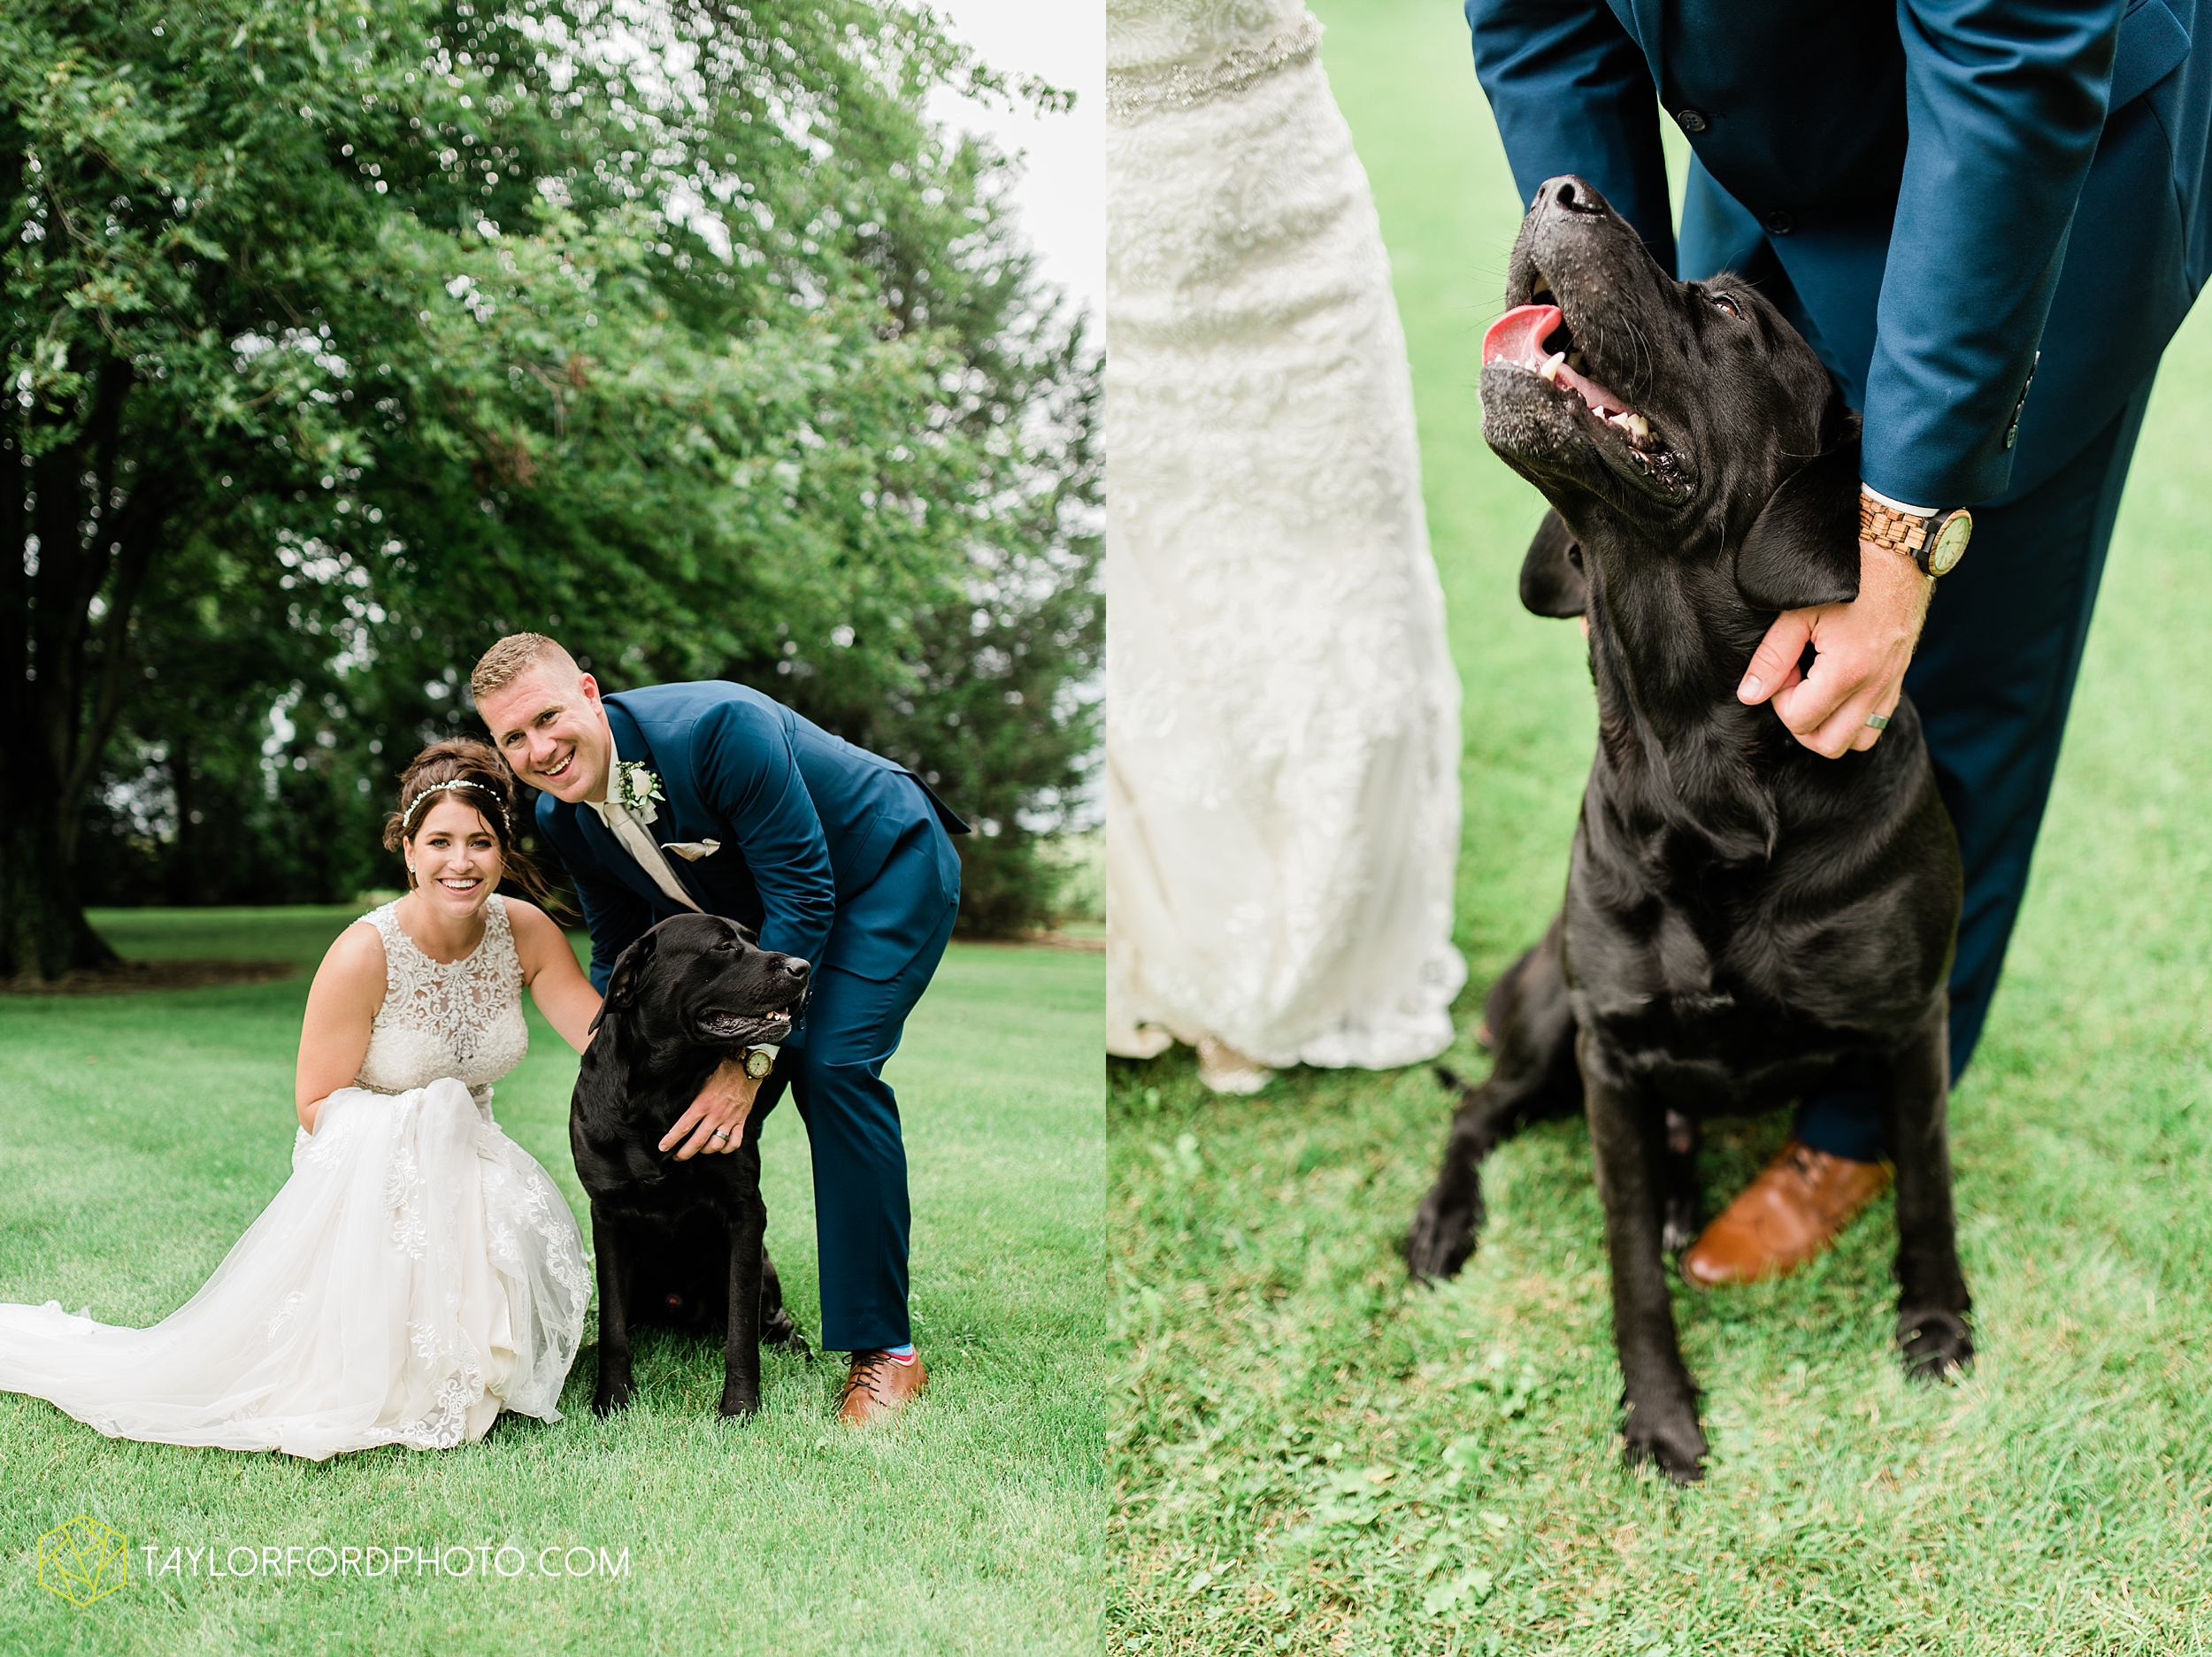 van-wert-ohio-first-united-methodist-church-county-dairy-barn-wedding-photographer-taylor-ford-photography_9859.jpg